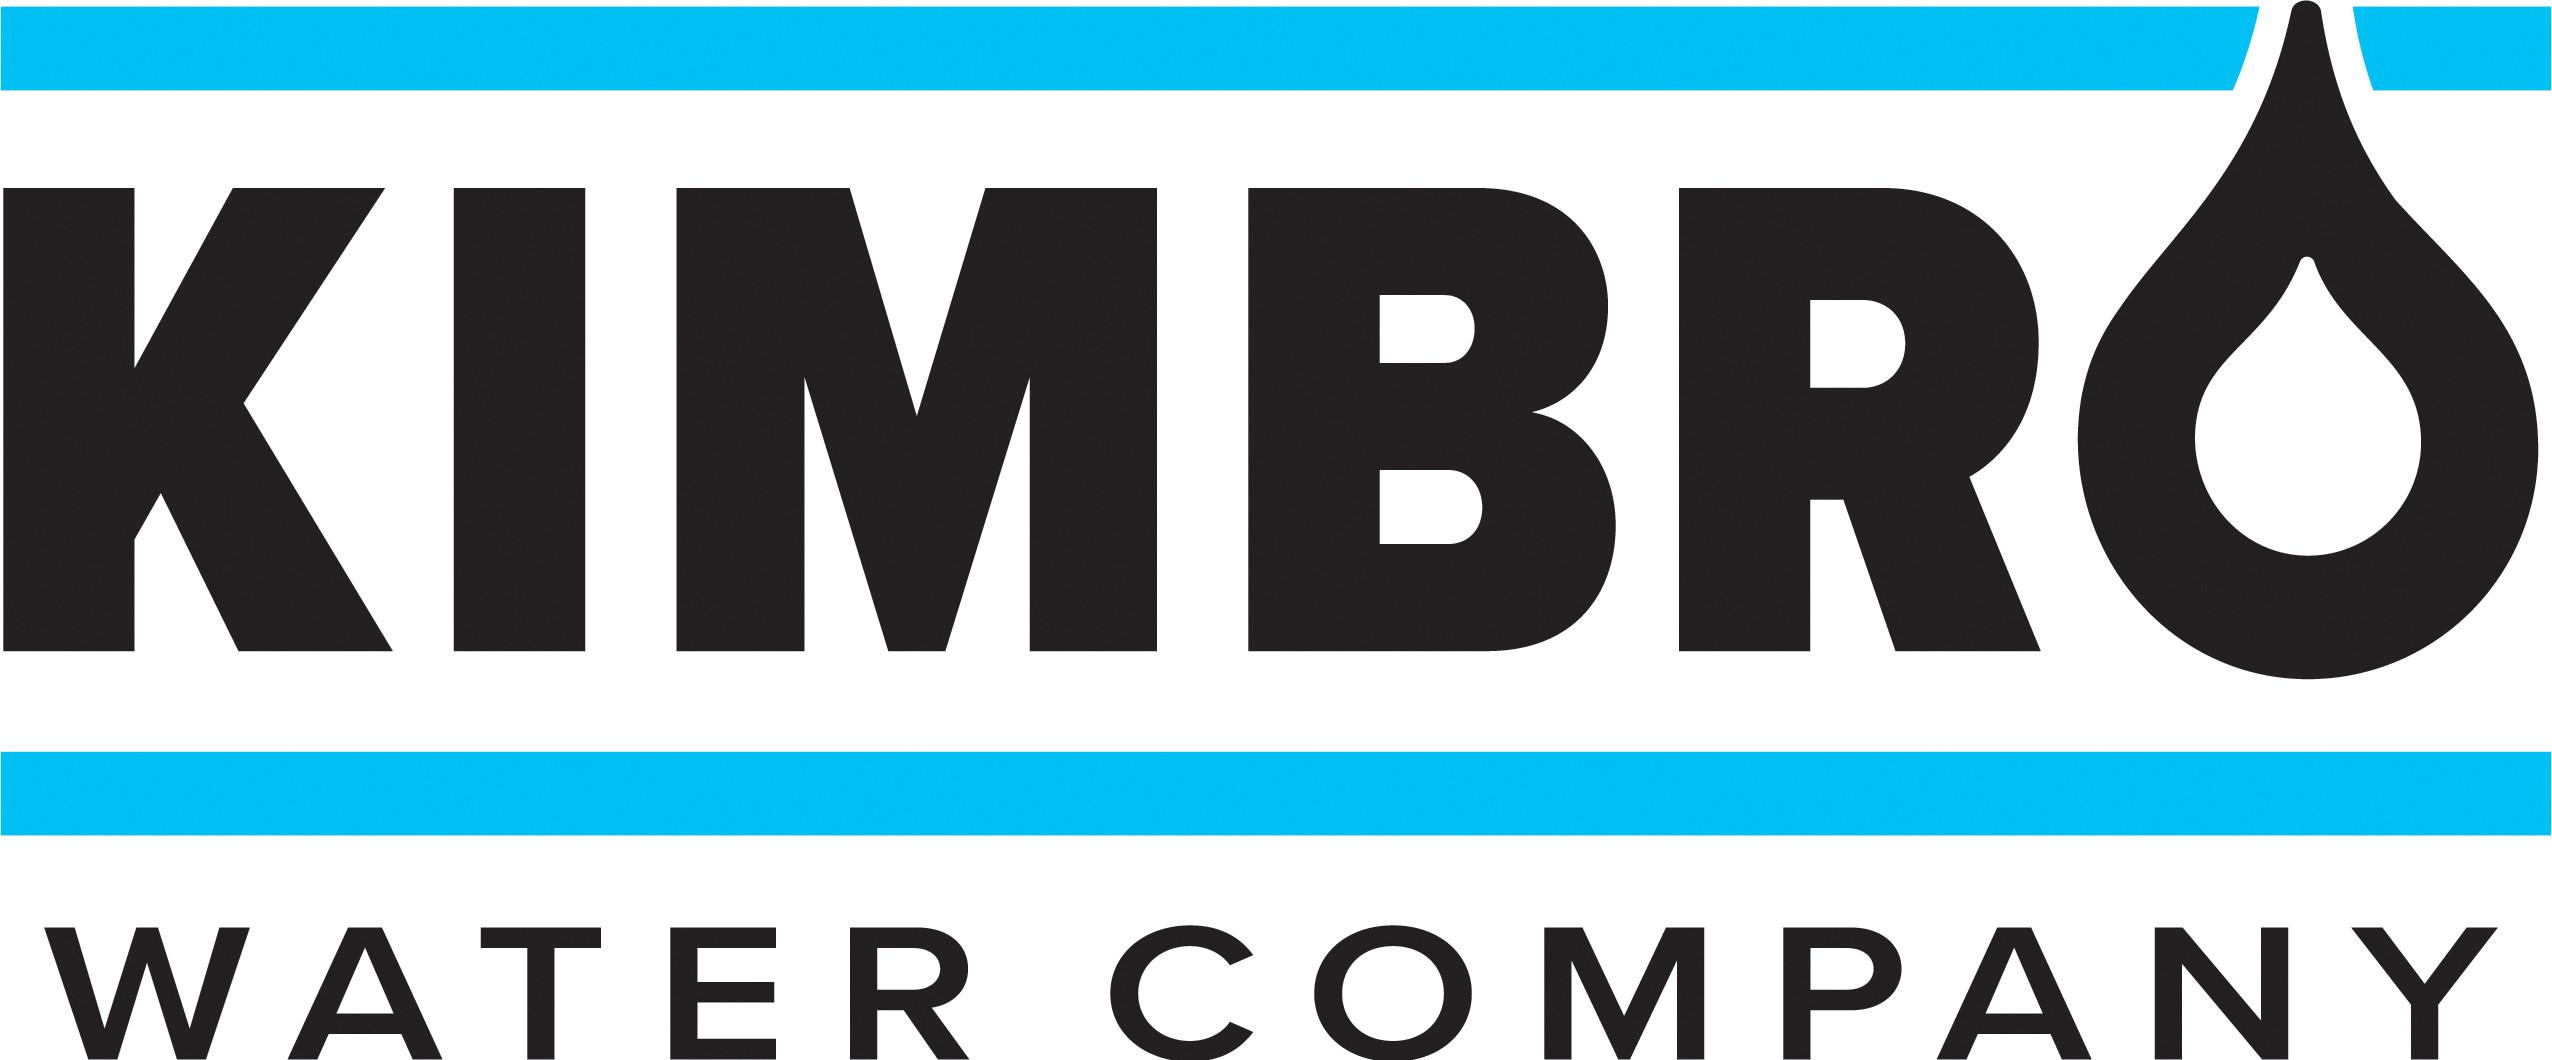 Kimbro Water